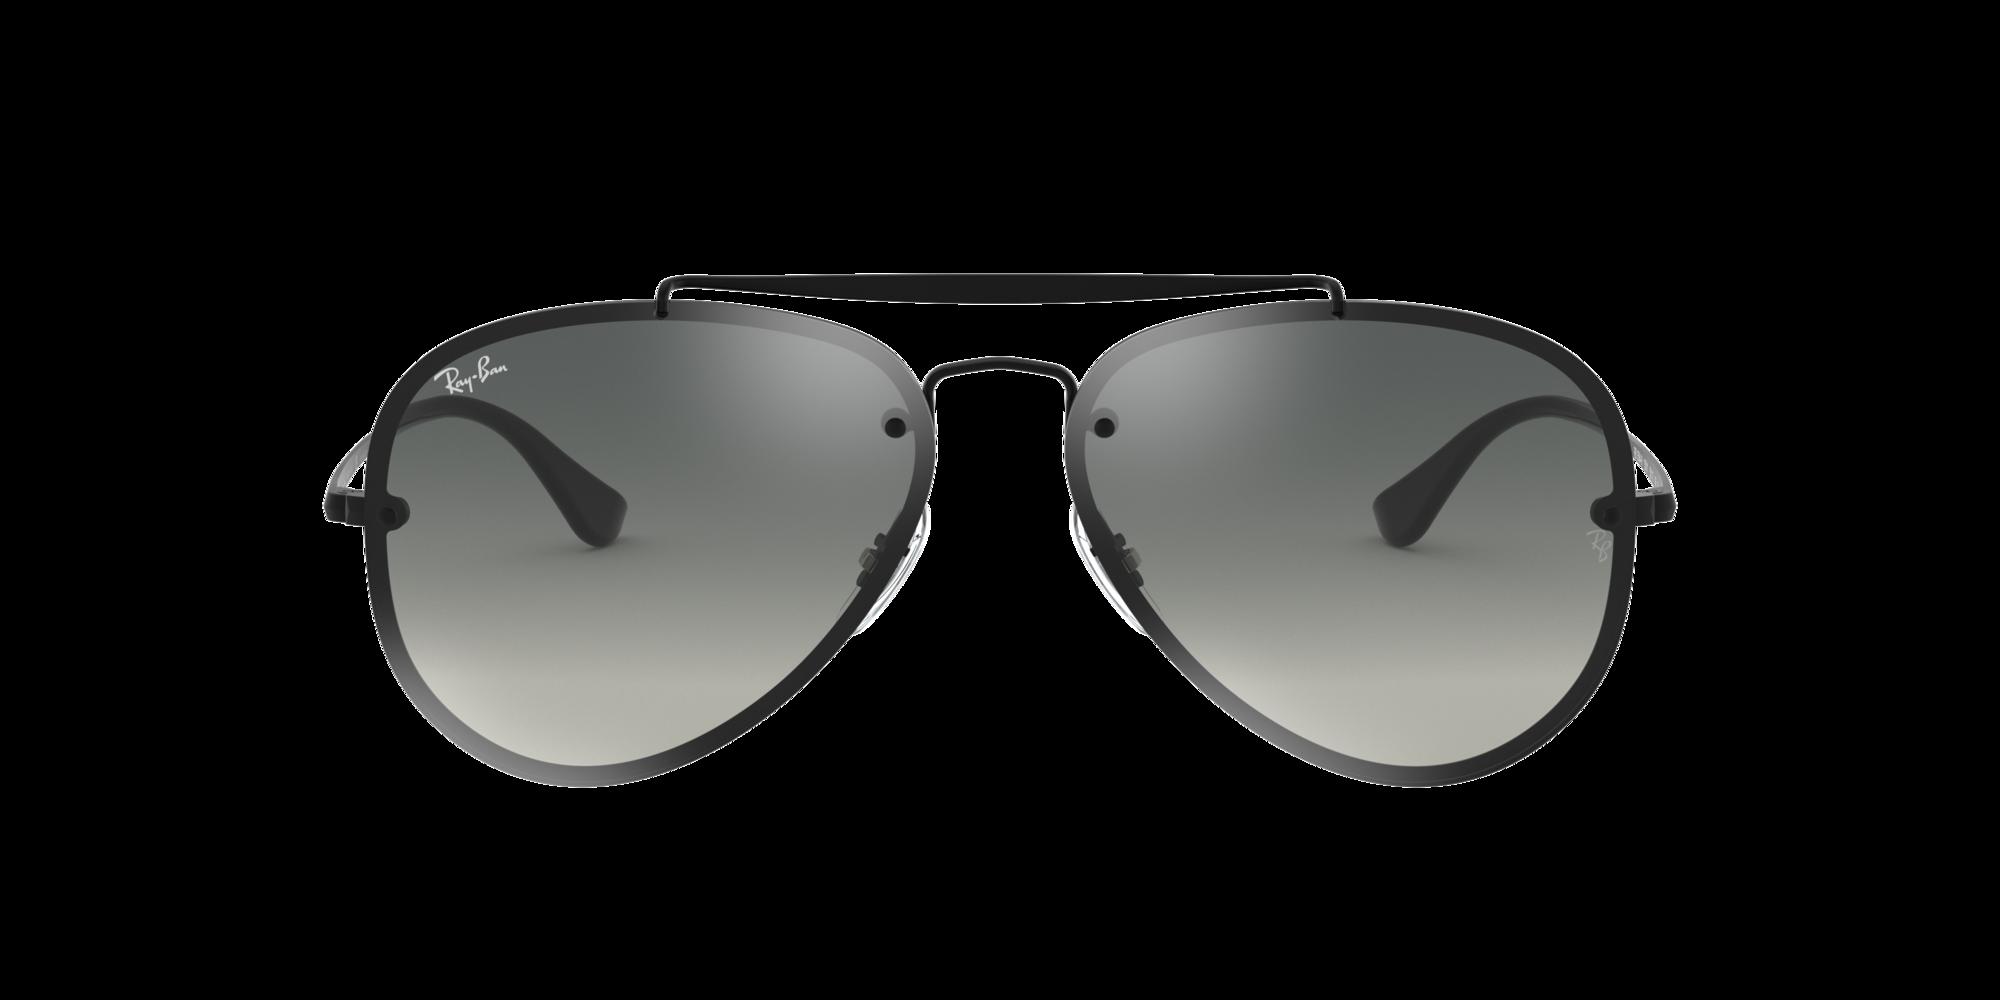 Image for RB3584N 58 from LensCrafters | Glasses, Prescription Glasses Online, Eyewear